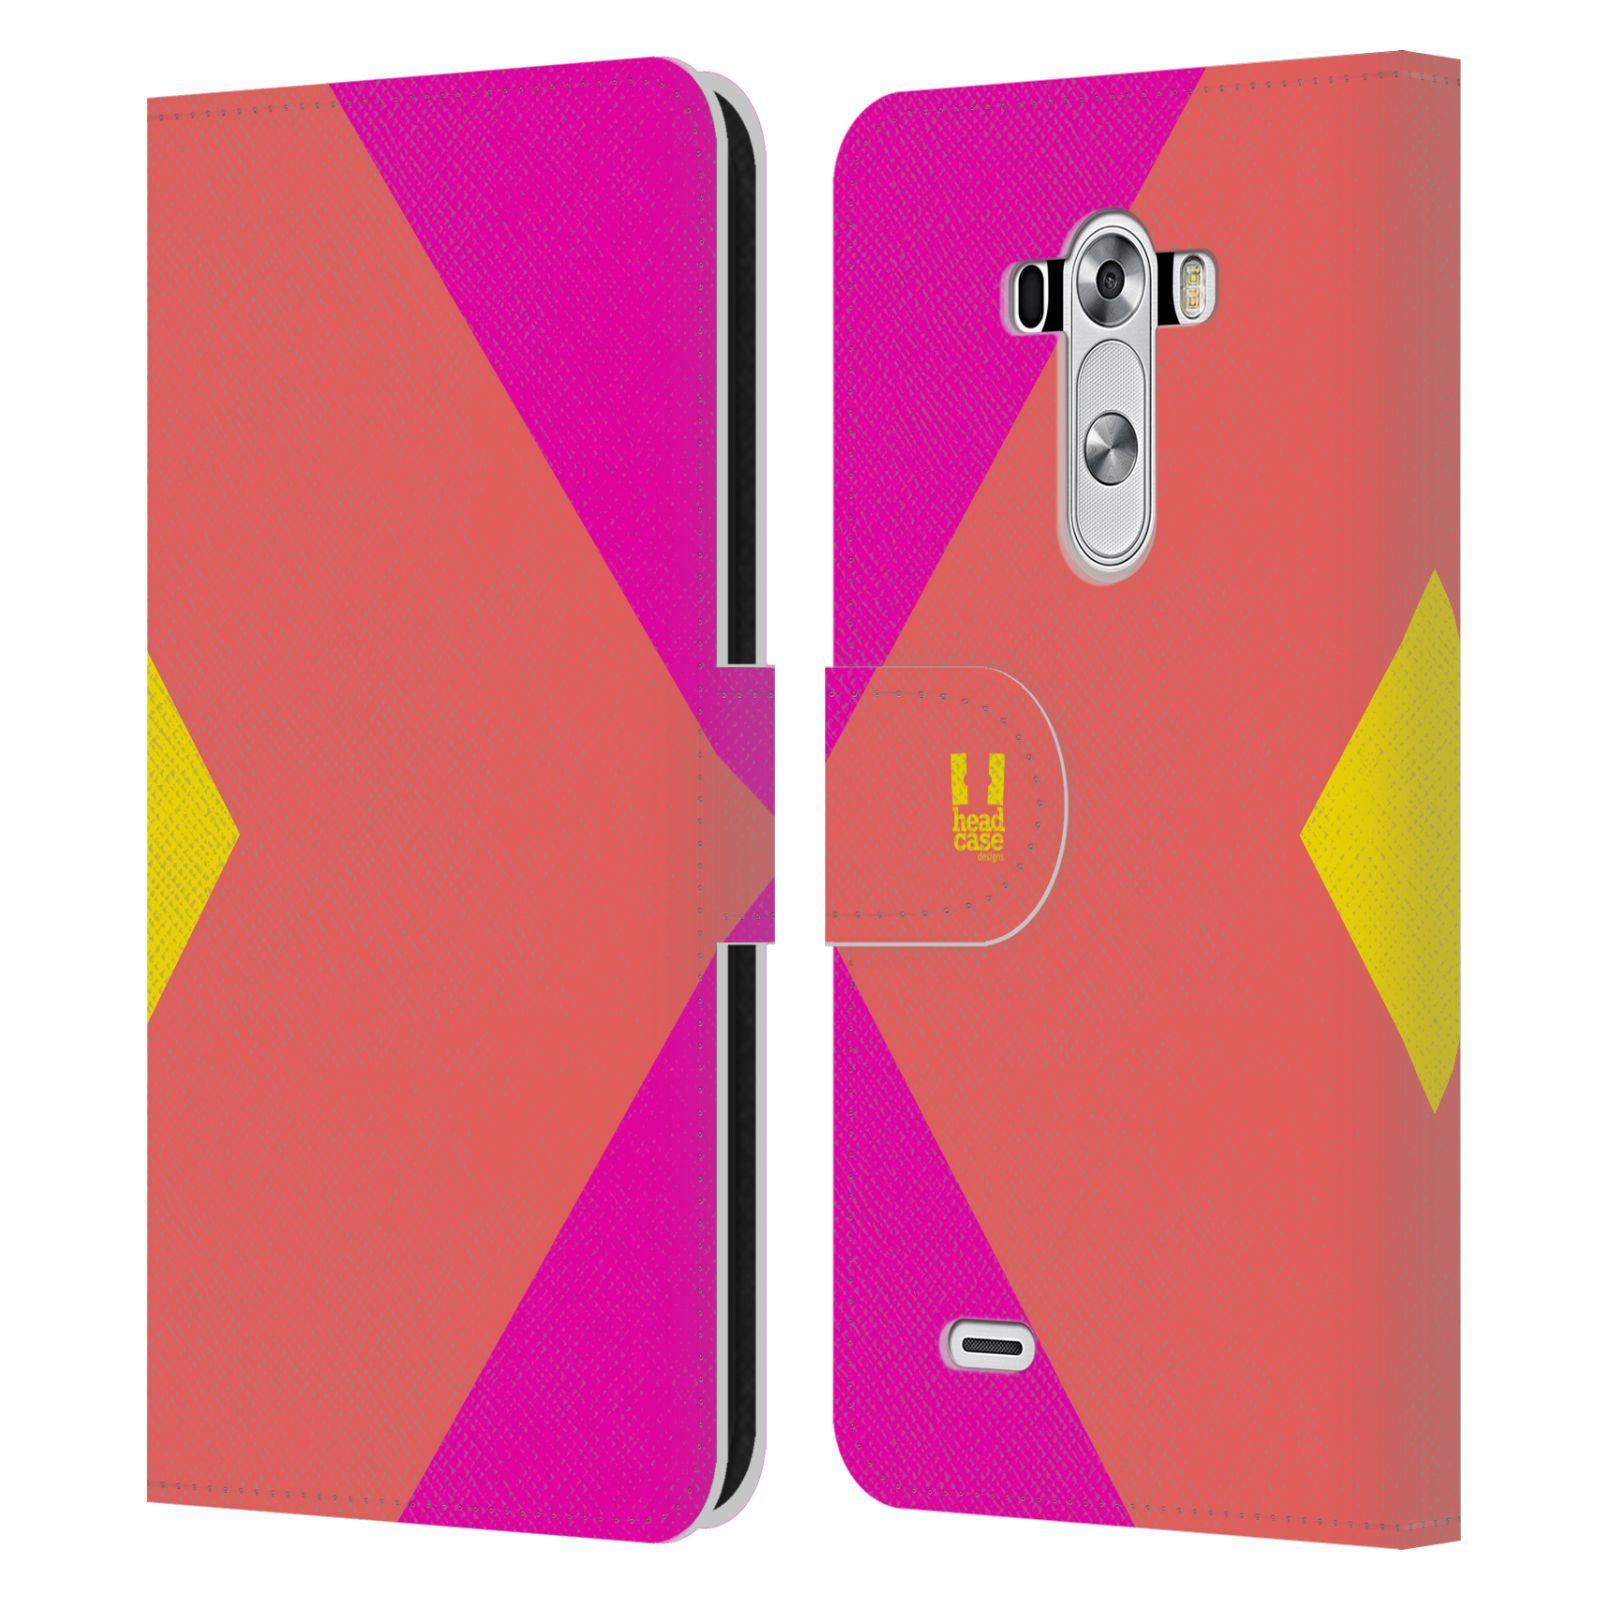 HEAD CASE Flipové pouzdro pro mobil LG G3 barevné tvary růžová korál